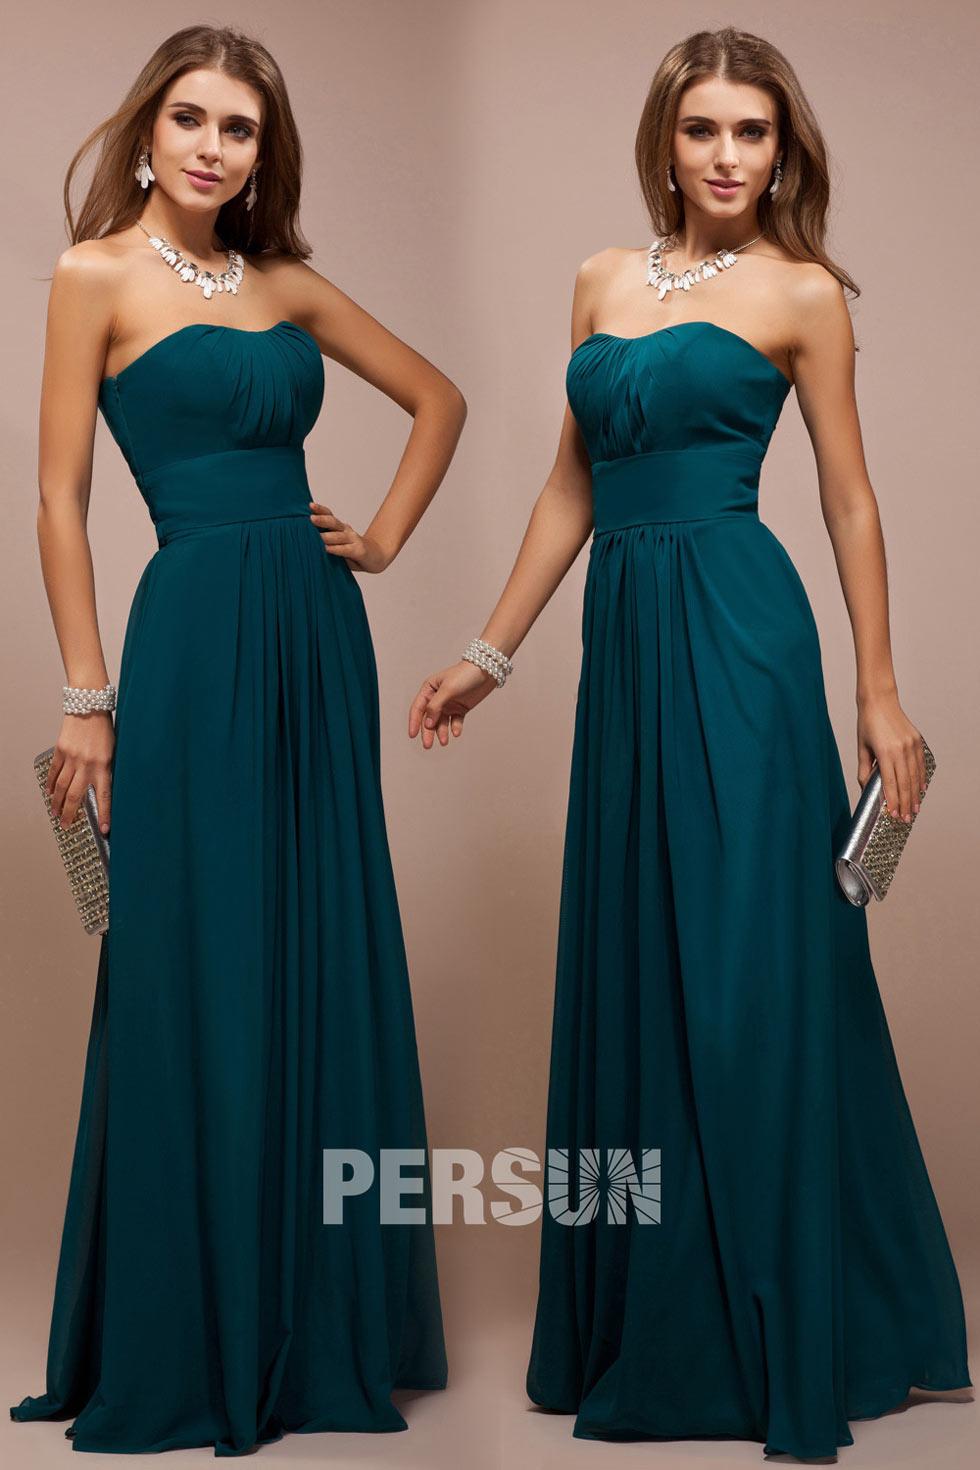 robe de soirée bustier vert pin élégante pour soirée de mariage